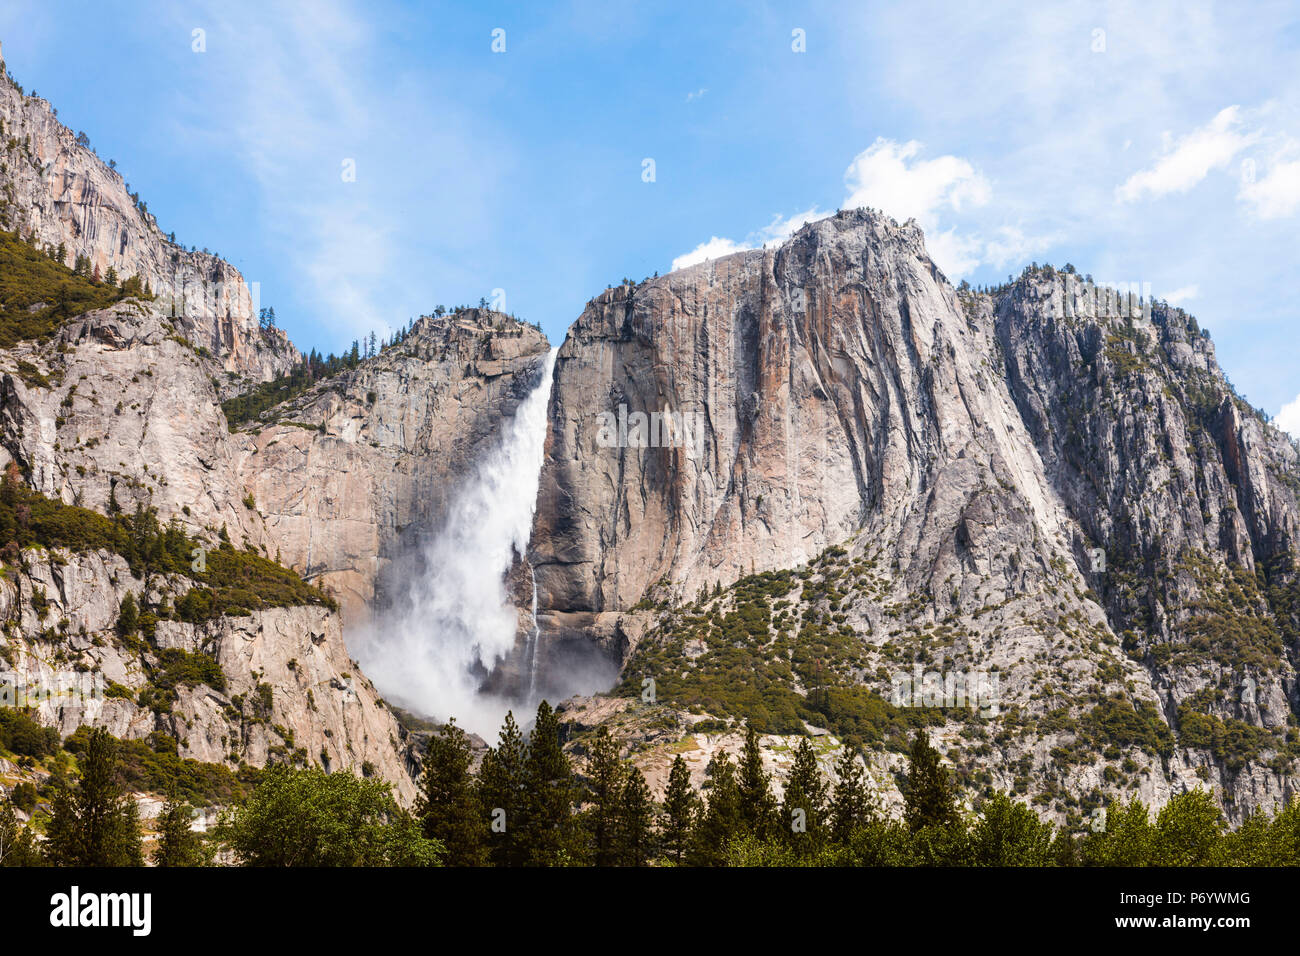 Upper Yosemite fall, Yosemite National Park, California, USA Stock Photo